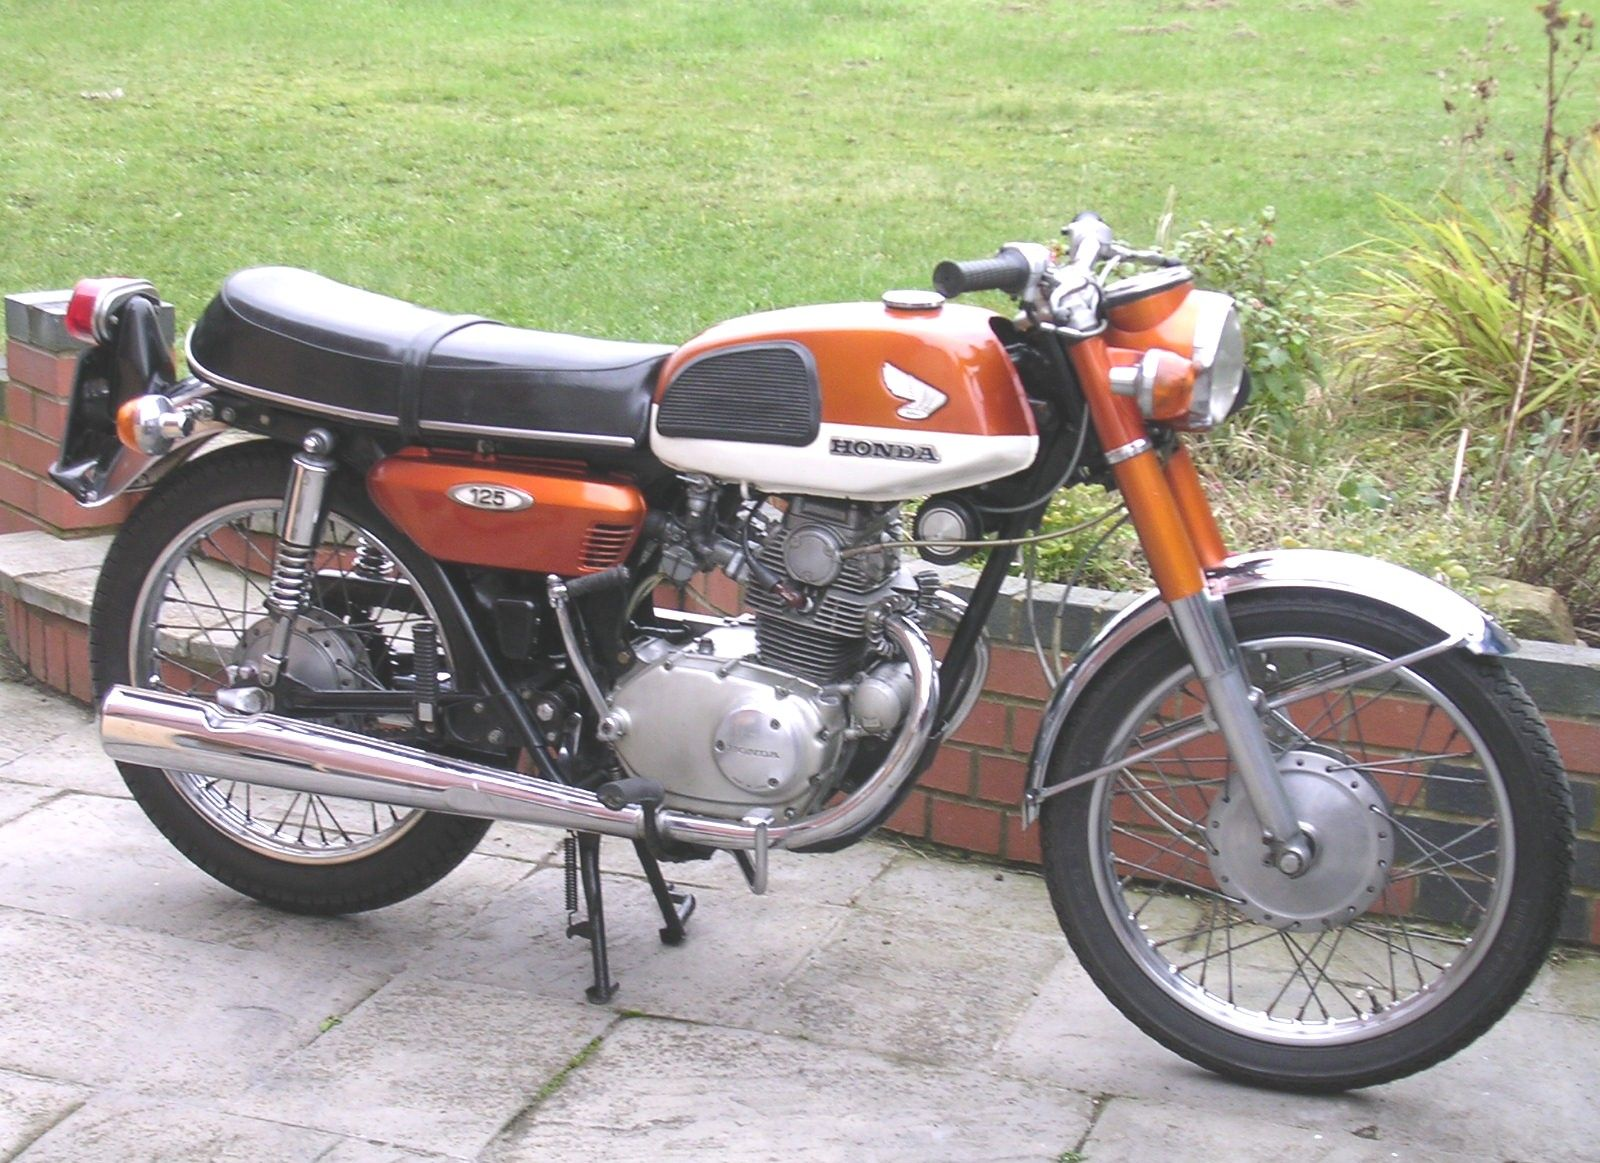 honda cb125 k4 1970 motorcycles pinterest honda honda cb and wheels. Black Bedroom Furniture Sets. Home Design Ideas